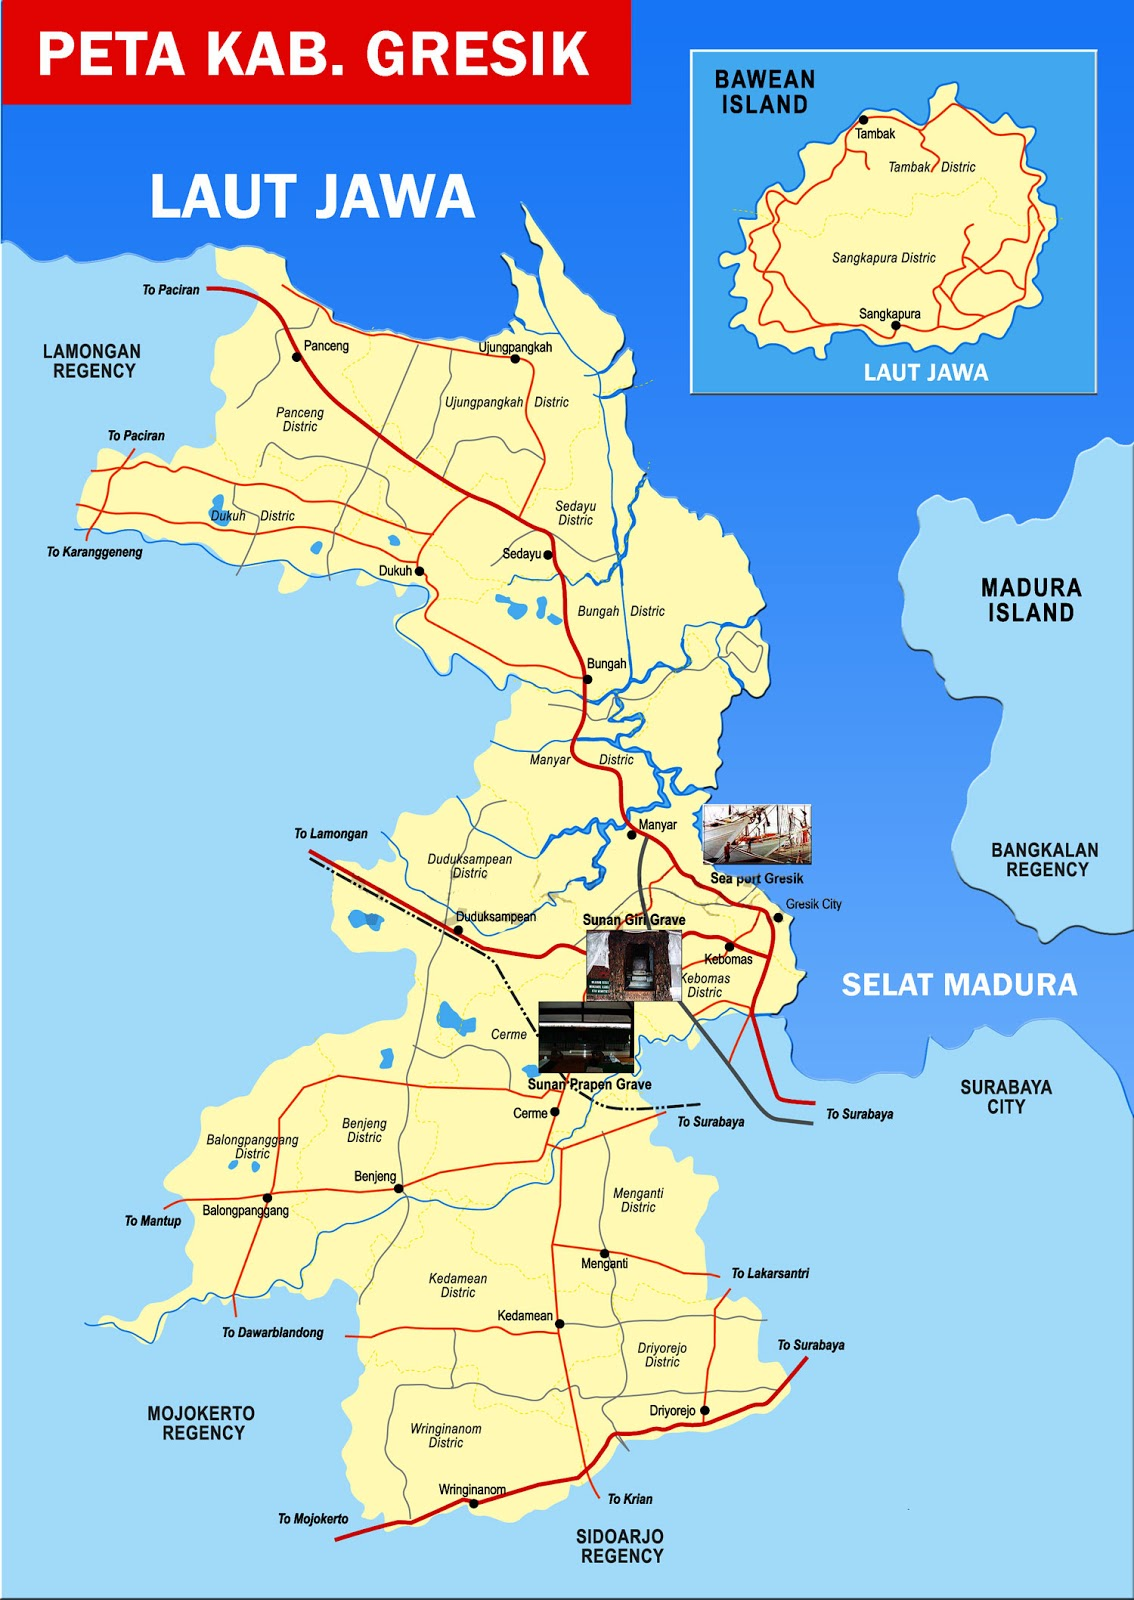 Peta Kabupaten Gresik, Jawa Timur | Sejarah Indonesia ...